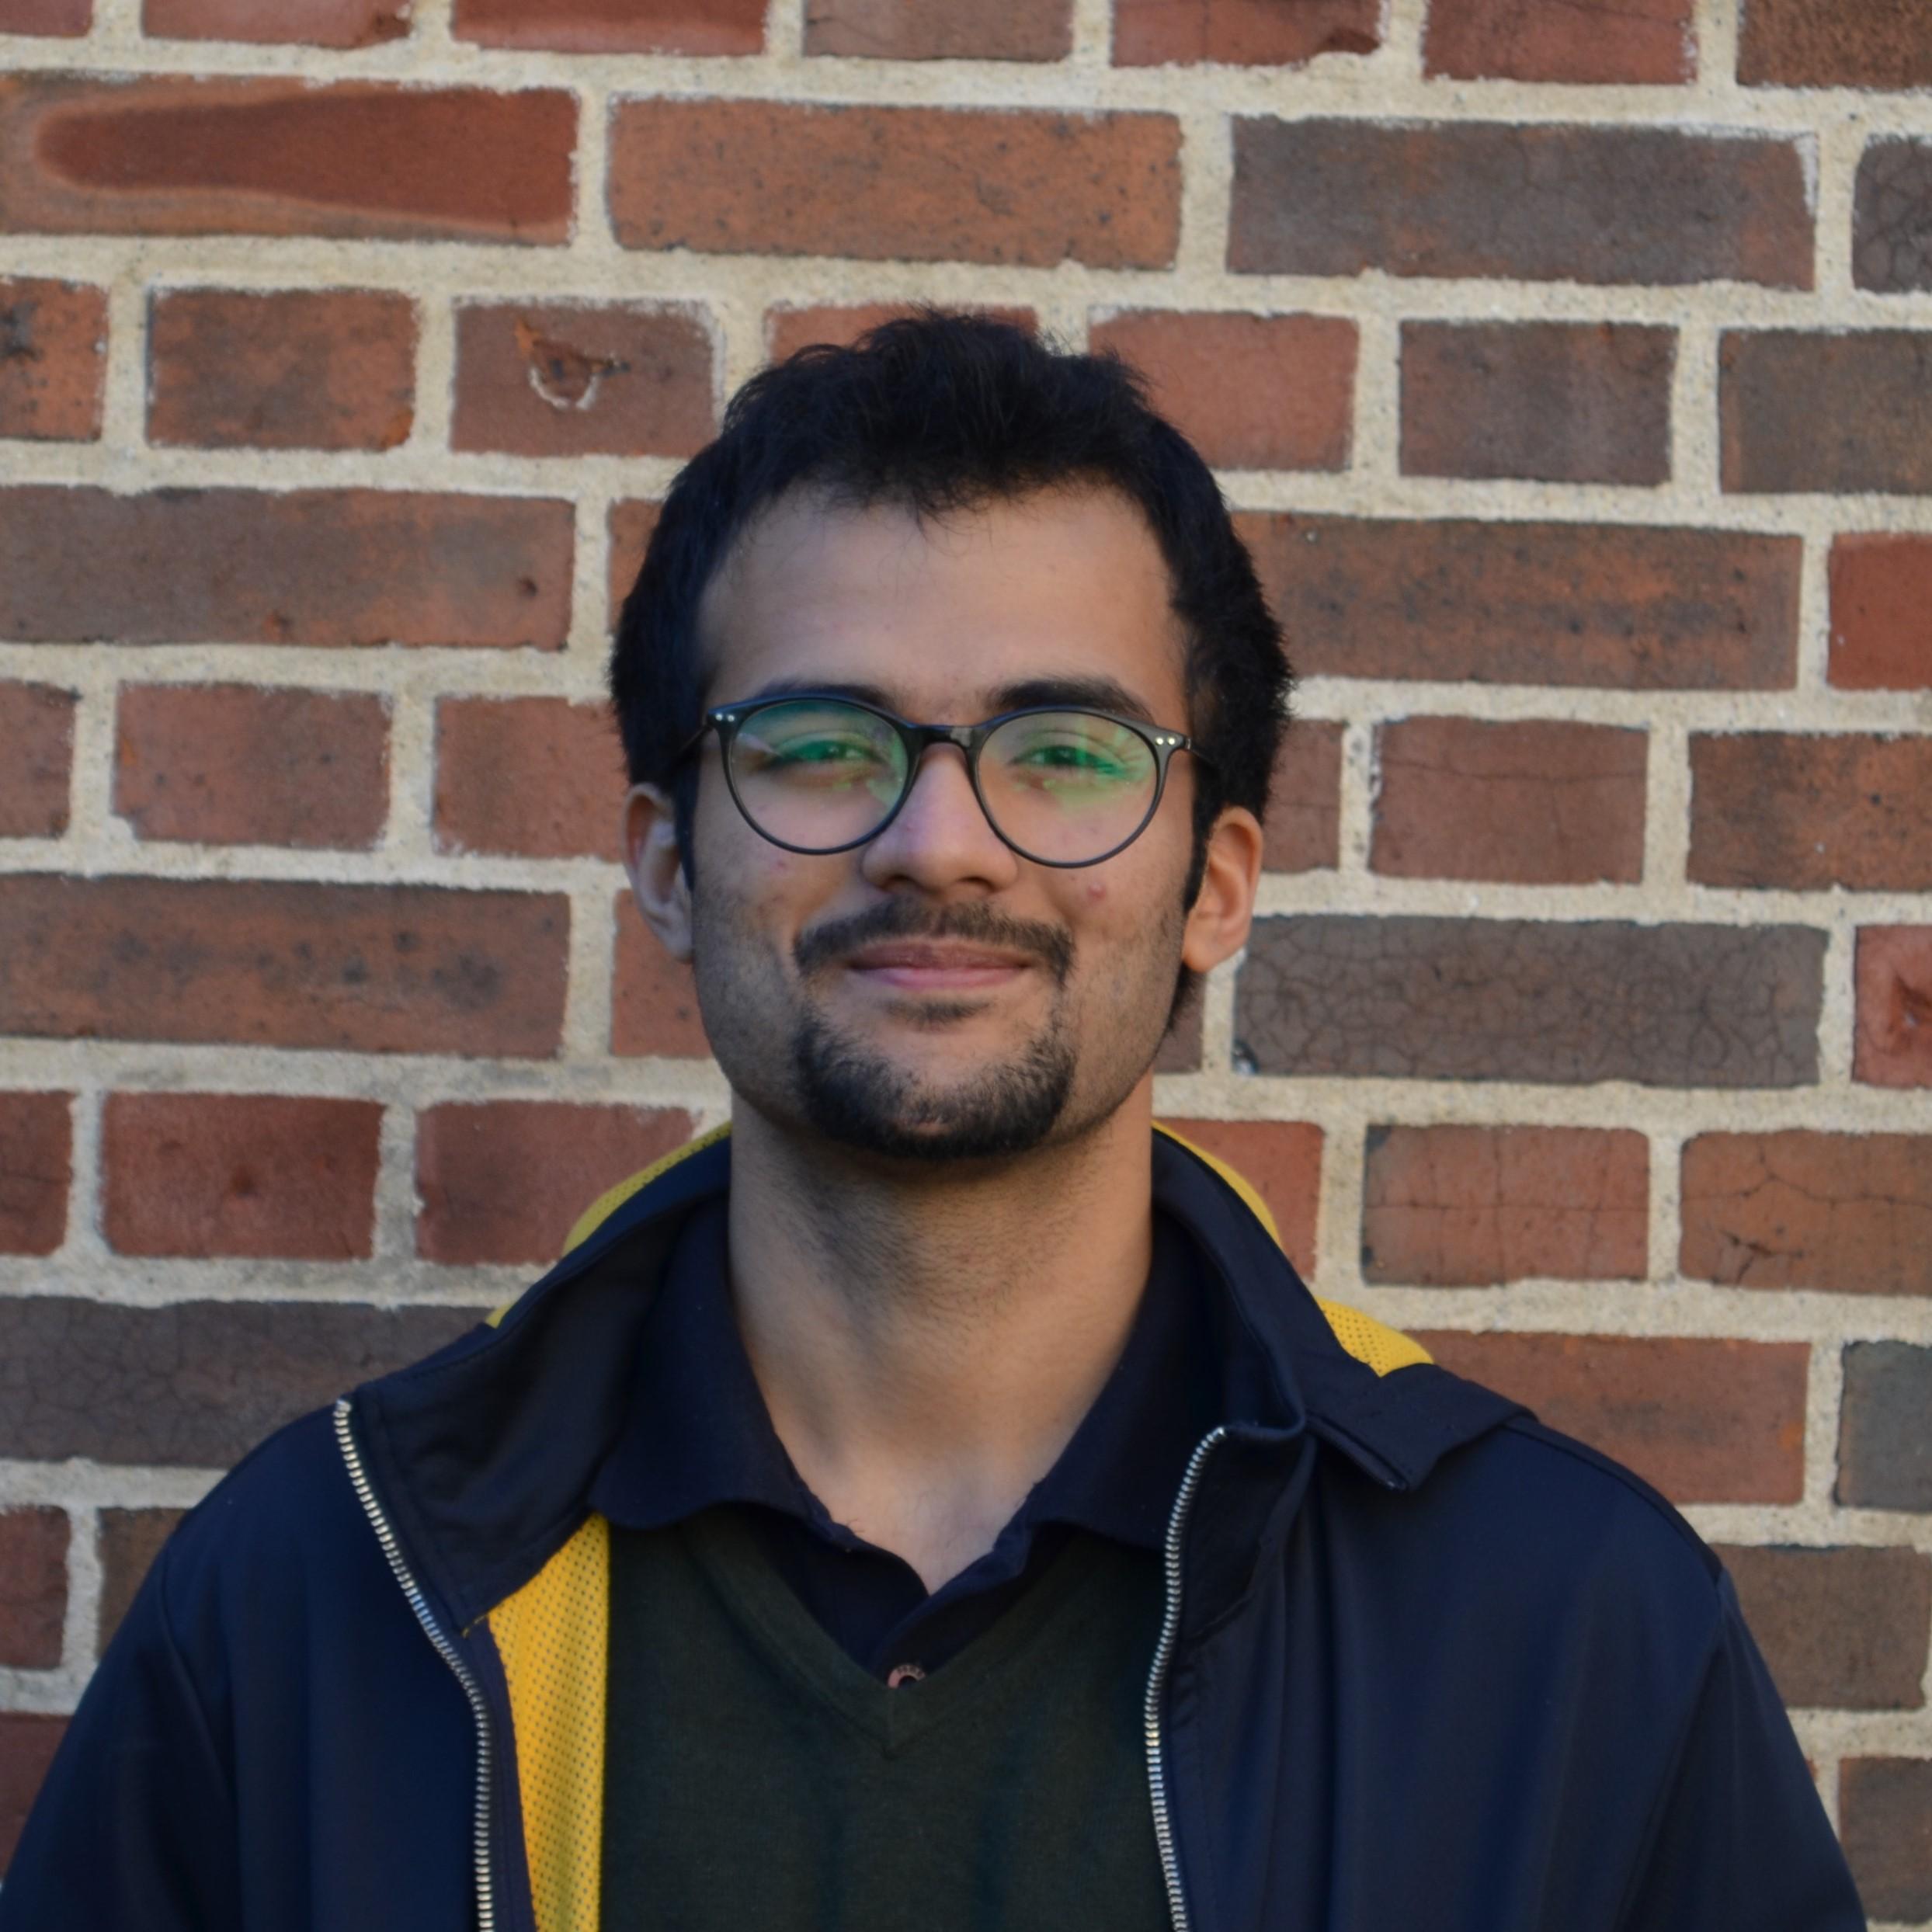 Chinmay Lohani - BSc Mathematics (Indian Institute of Science), MSc Econometrics and Mathematical Economics (LSE)Faculty Supervisor: Fiona Burlig